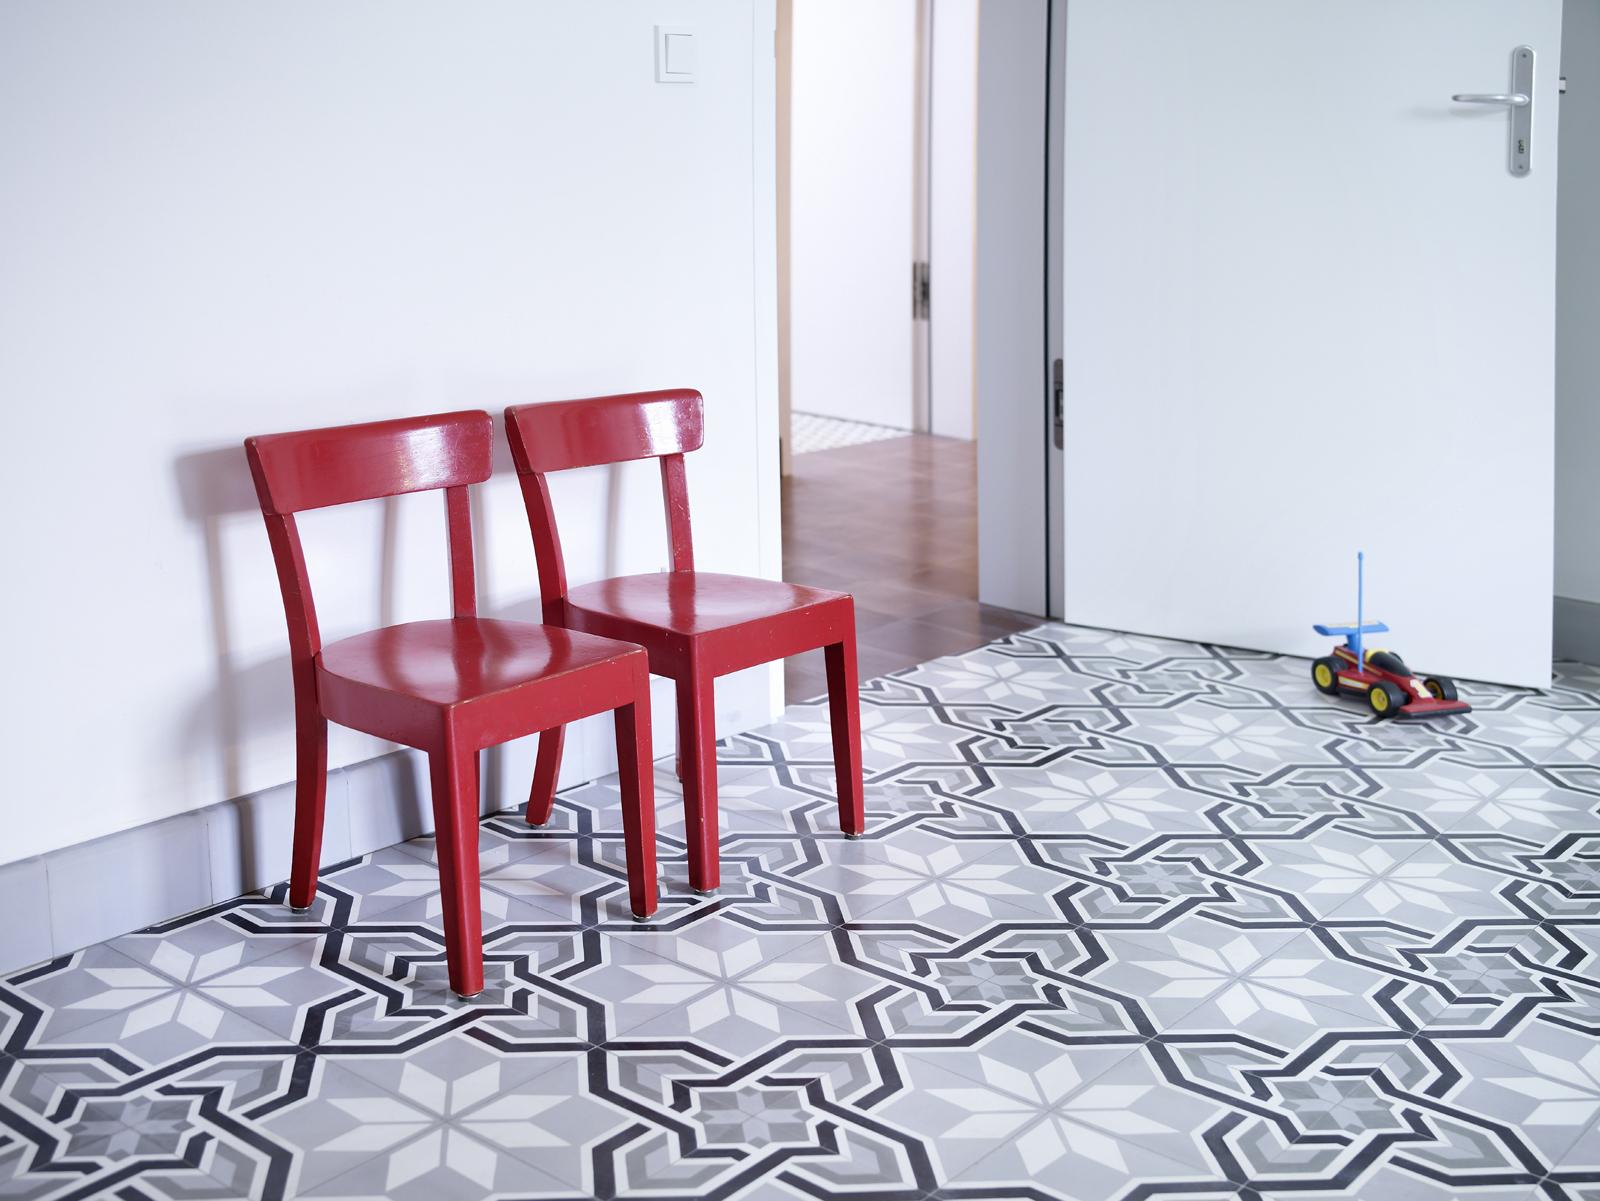 zementmosaikplatten-nummer-13252-kinderzimmer-via-gmbh | 13252